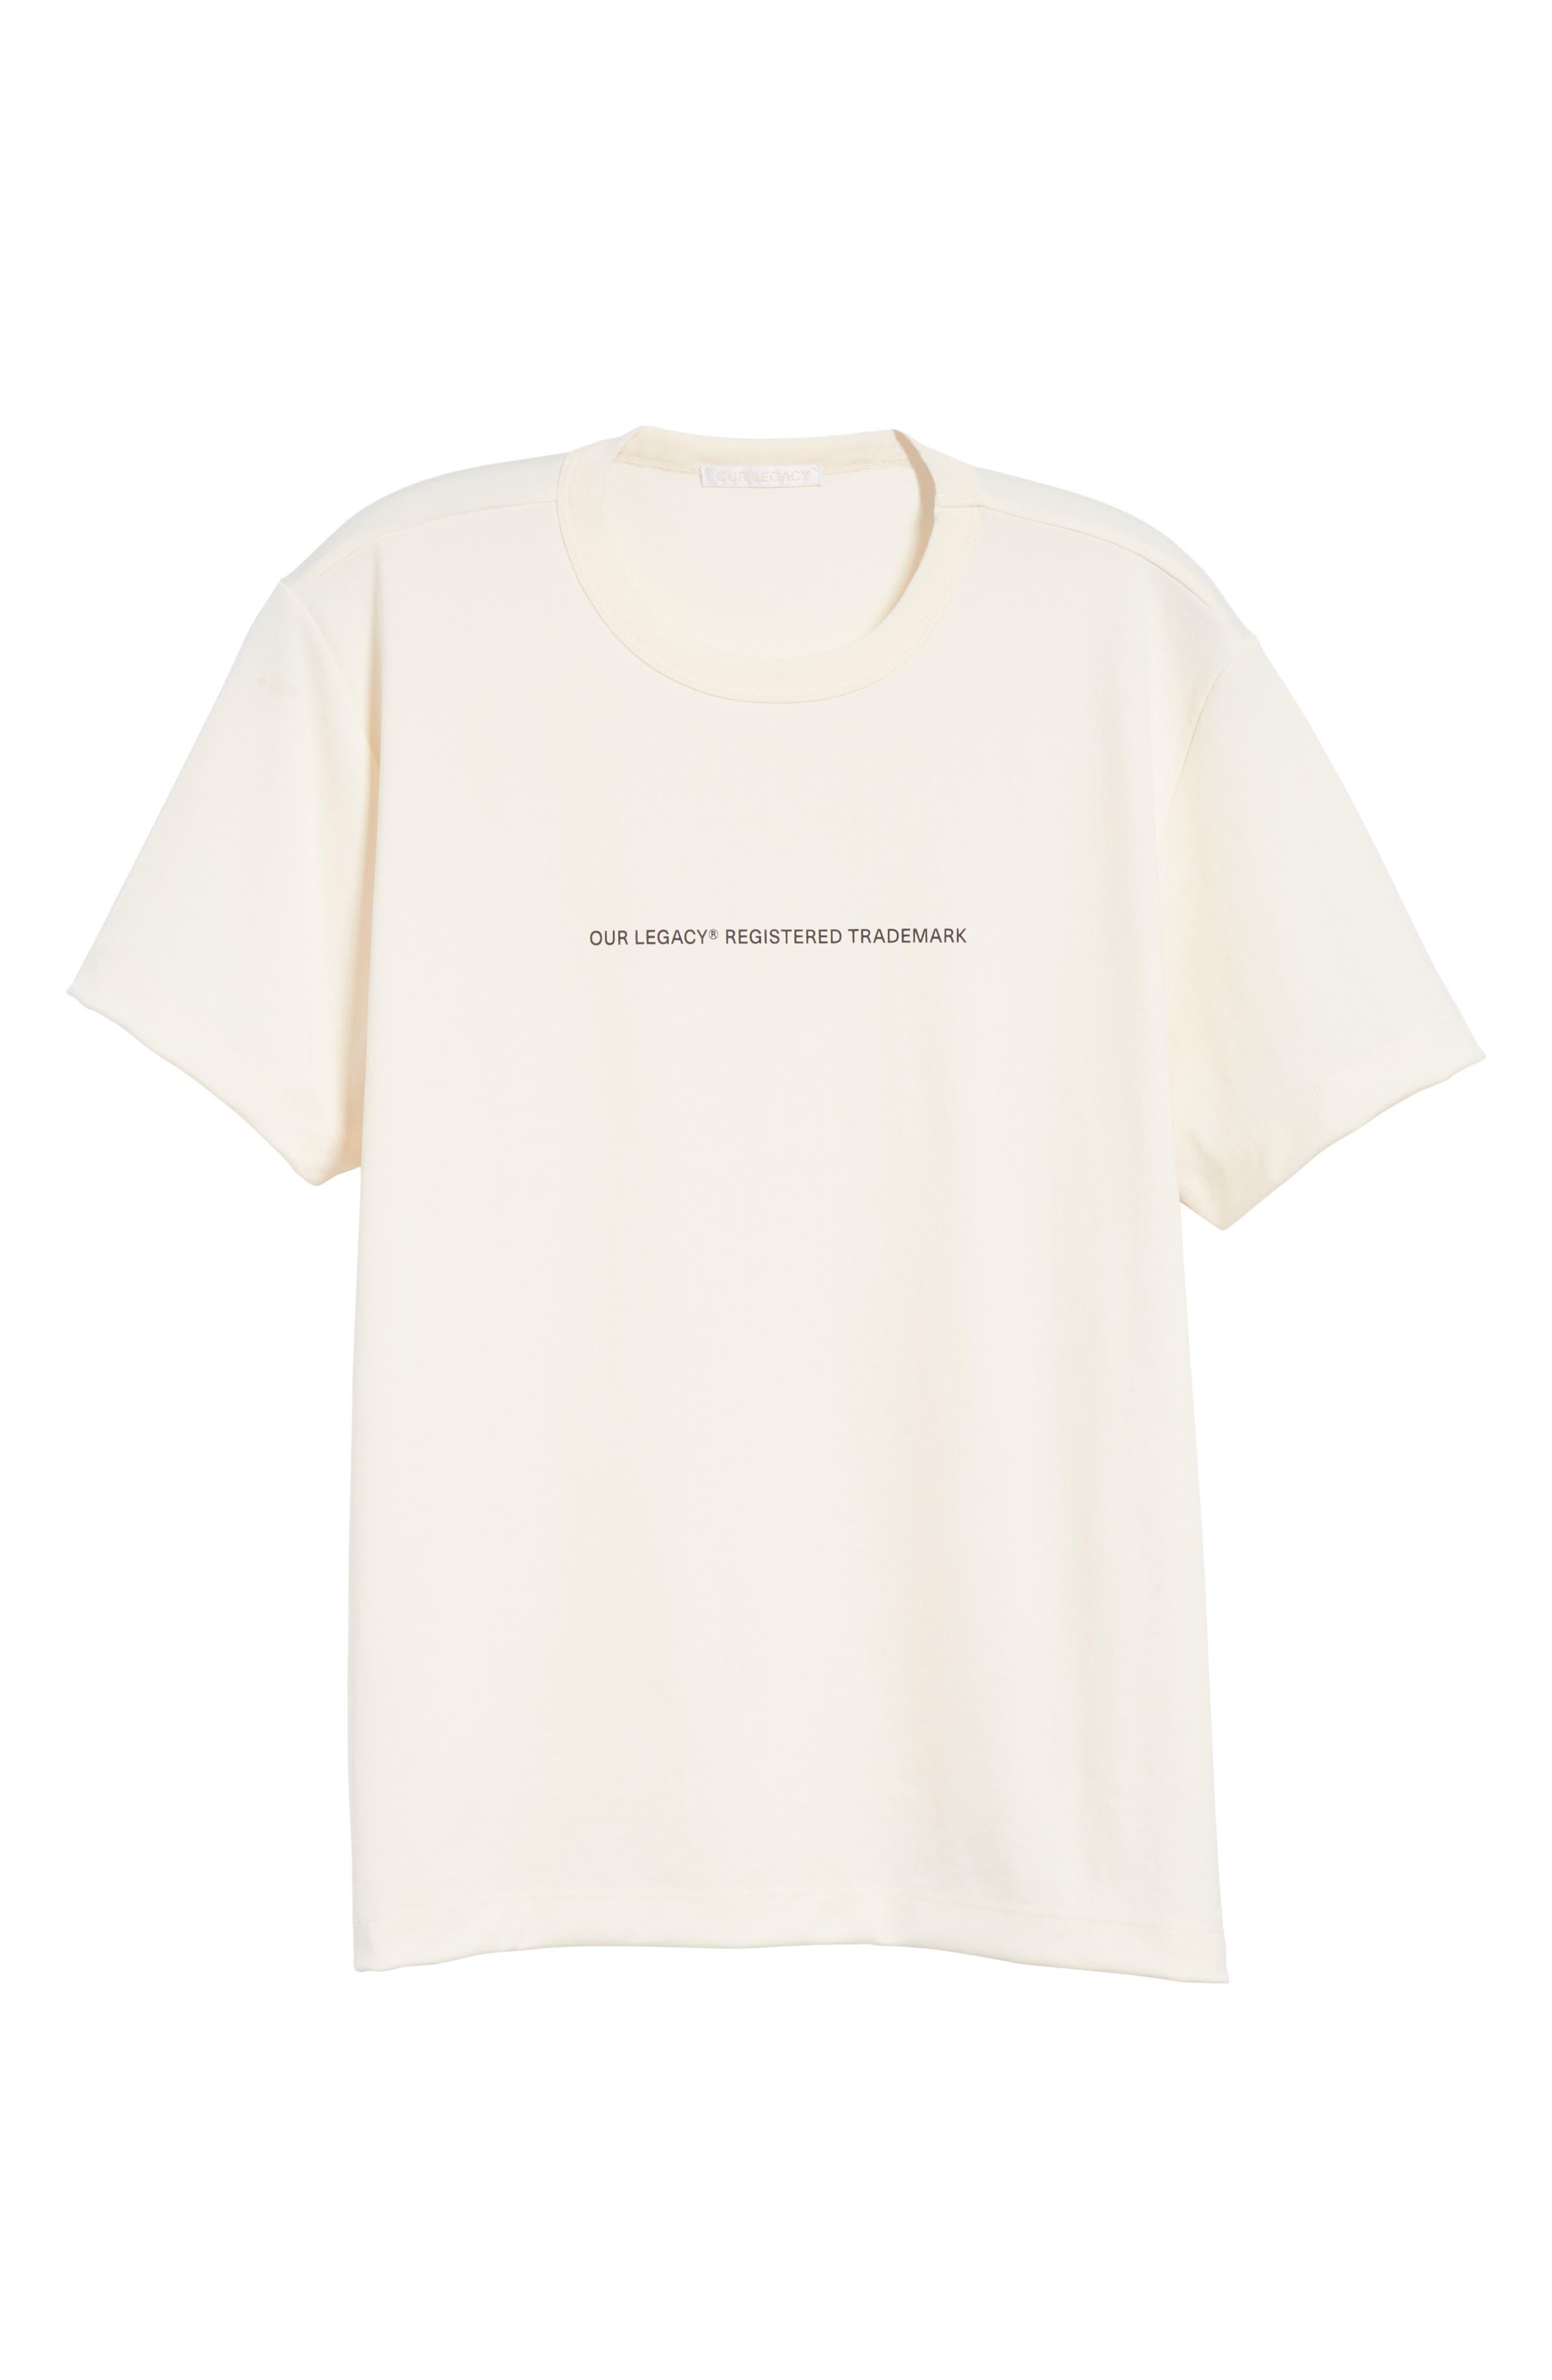 Trademark Graphic T-Shirt,                             Alternate thumbnail 6, color,                             White